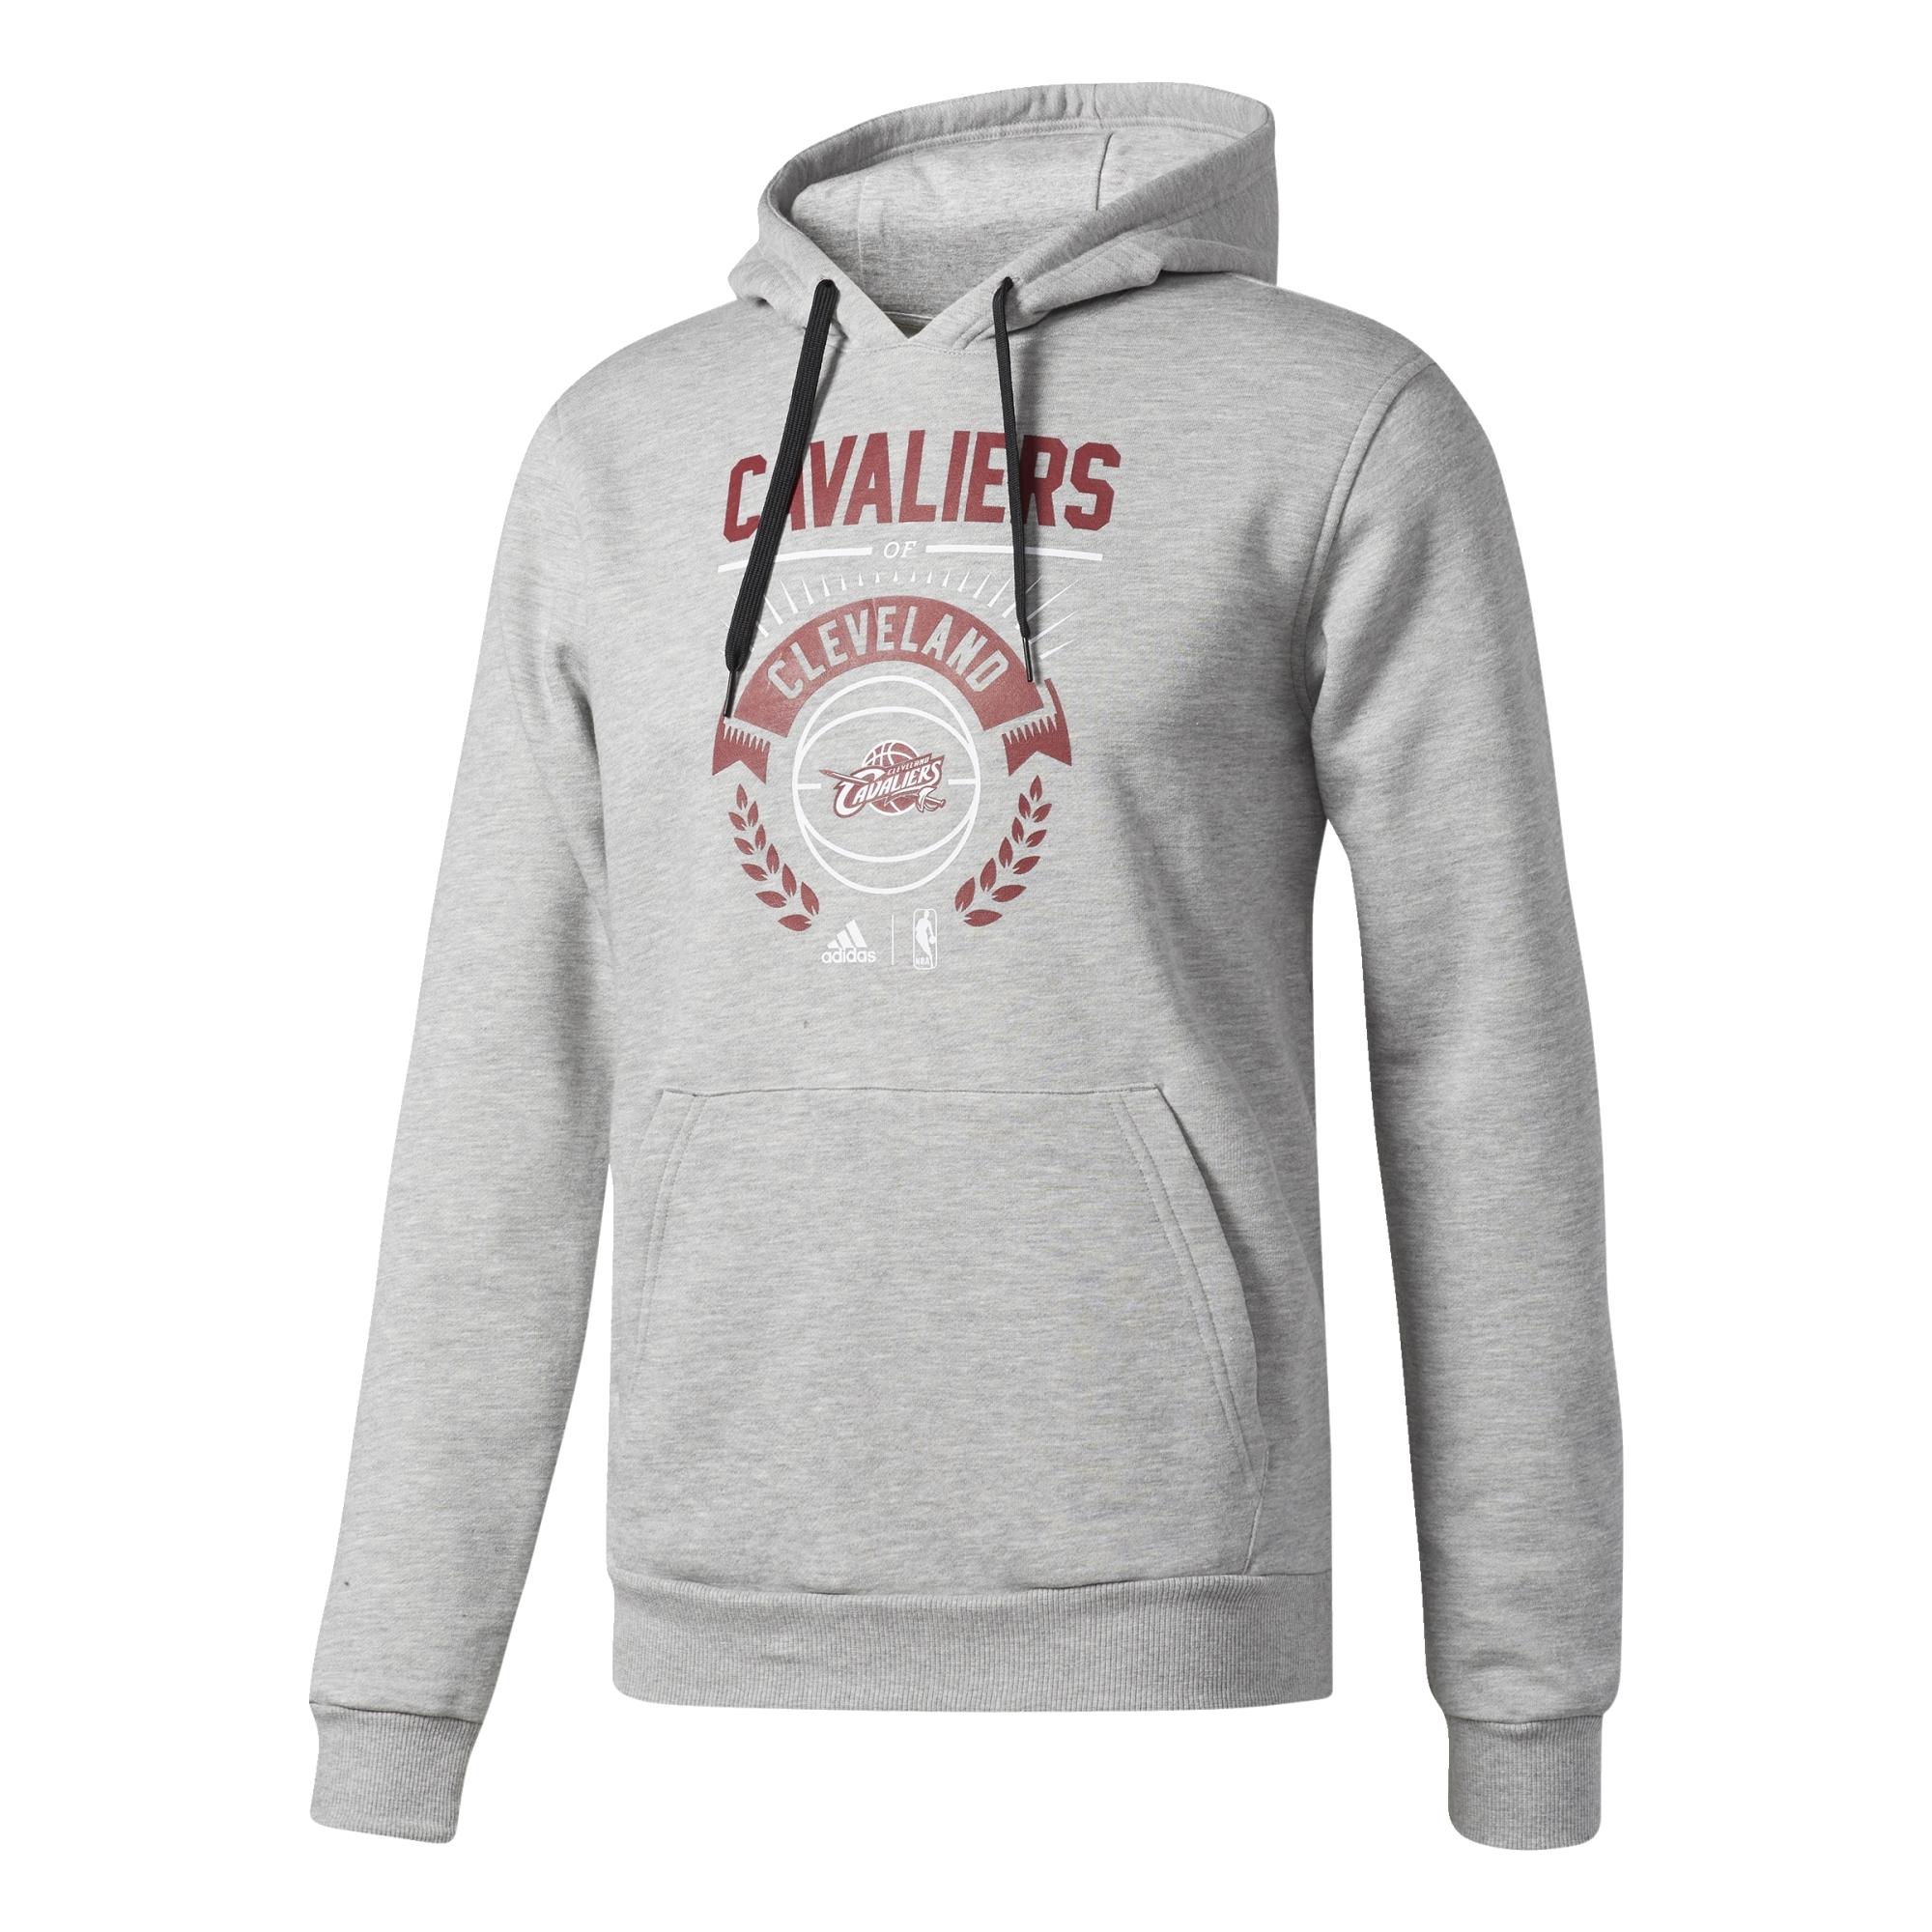 Cavaliersnba Hoodie Adidas Cca Pullover Nba Washed TF1JlKc3